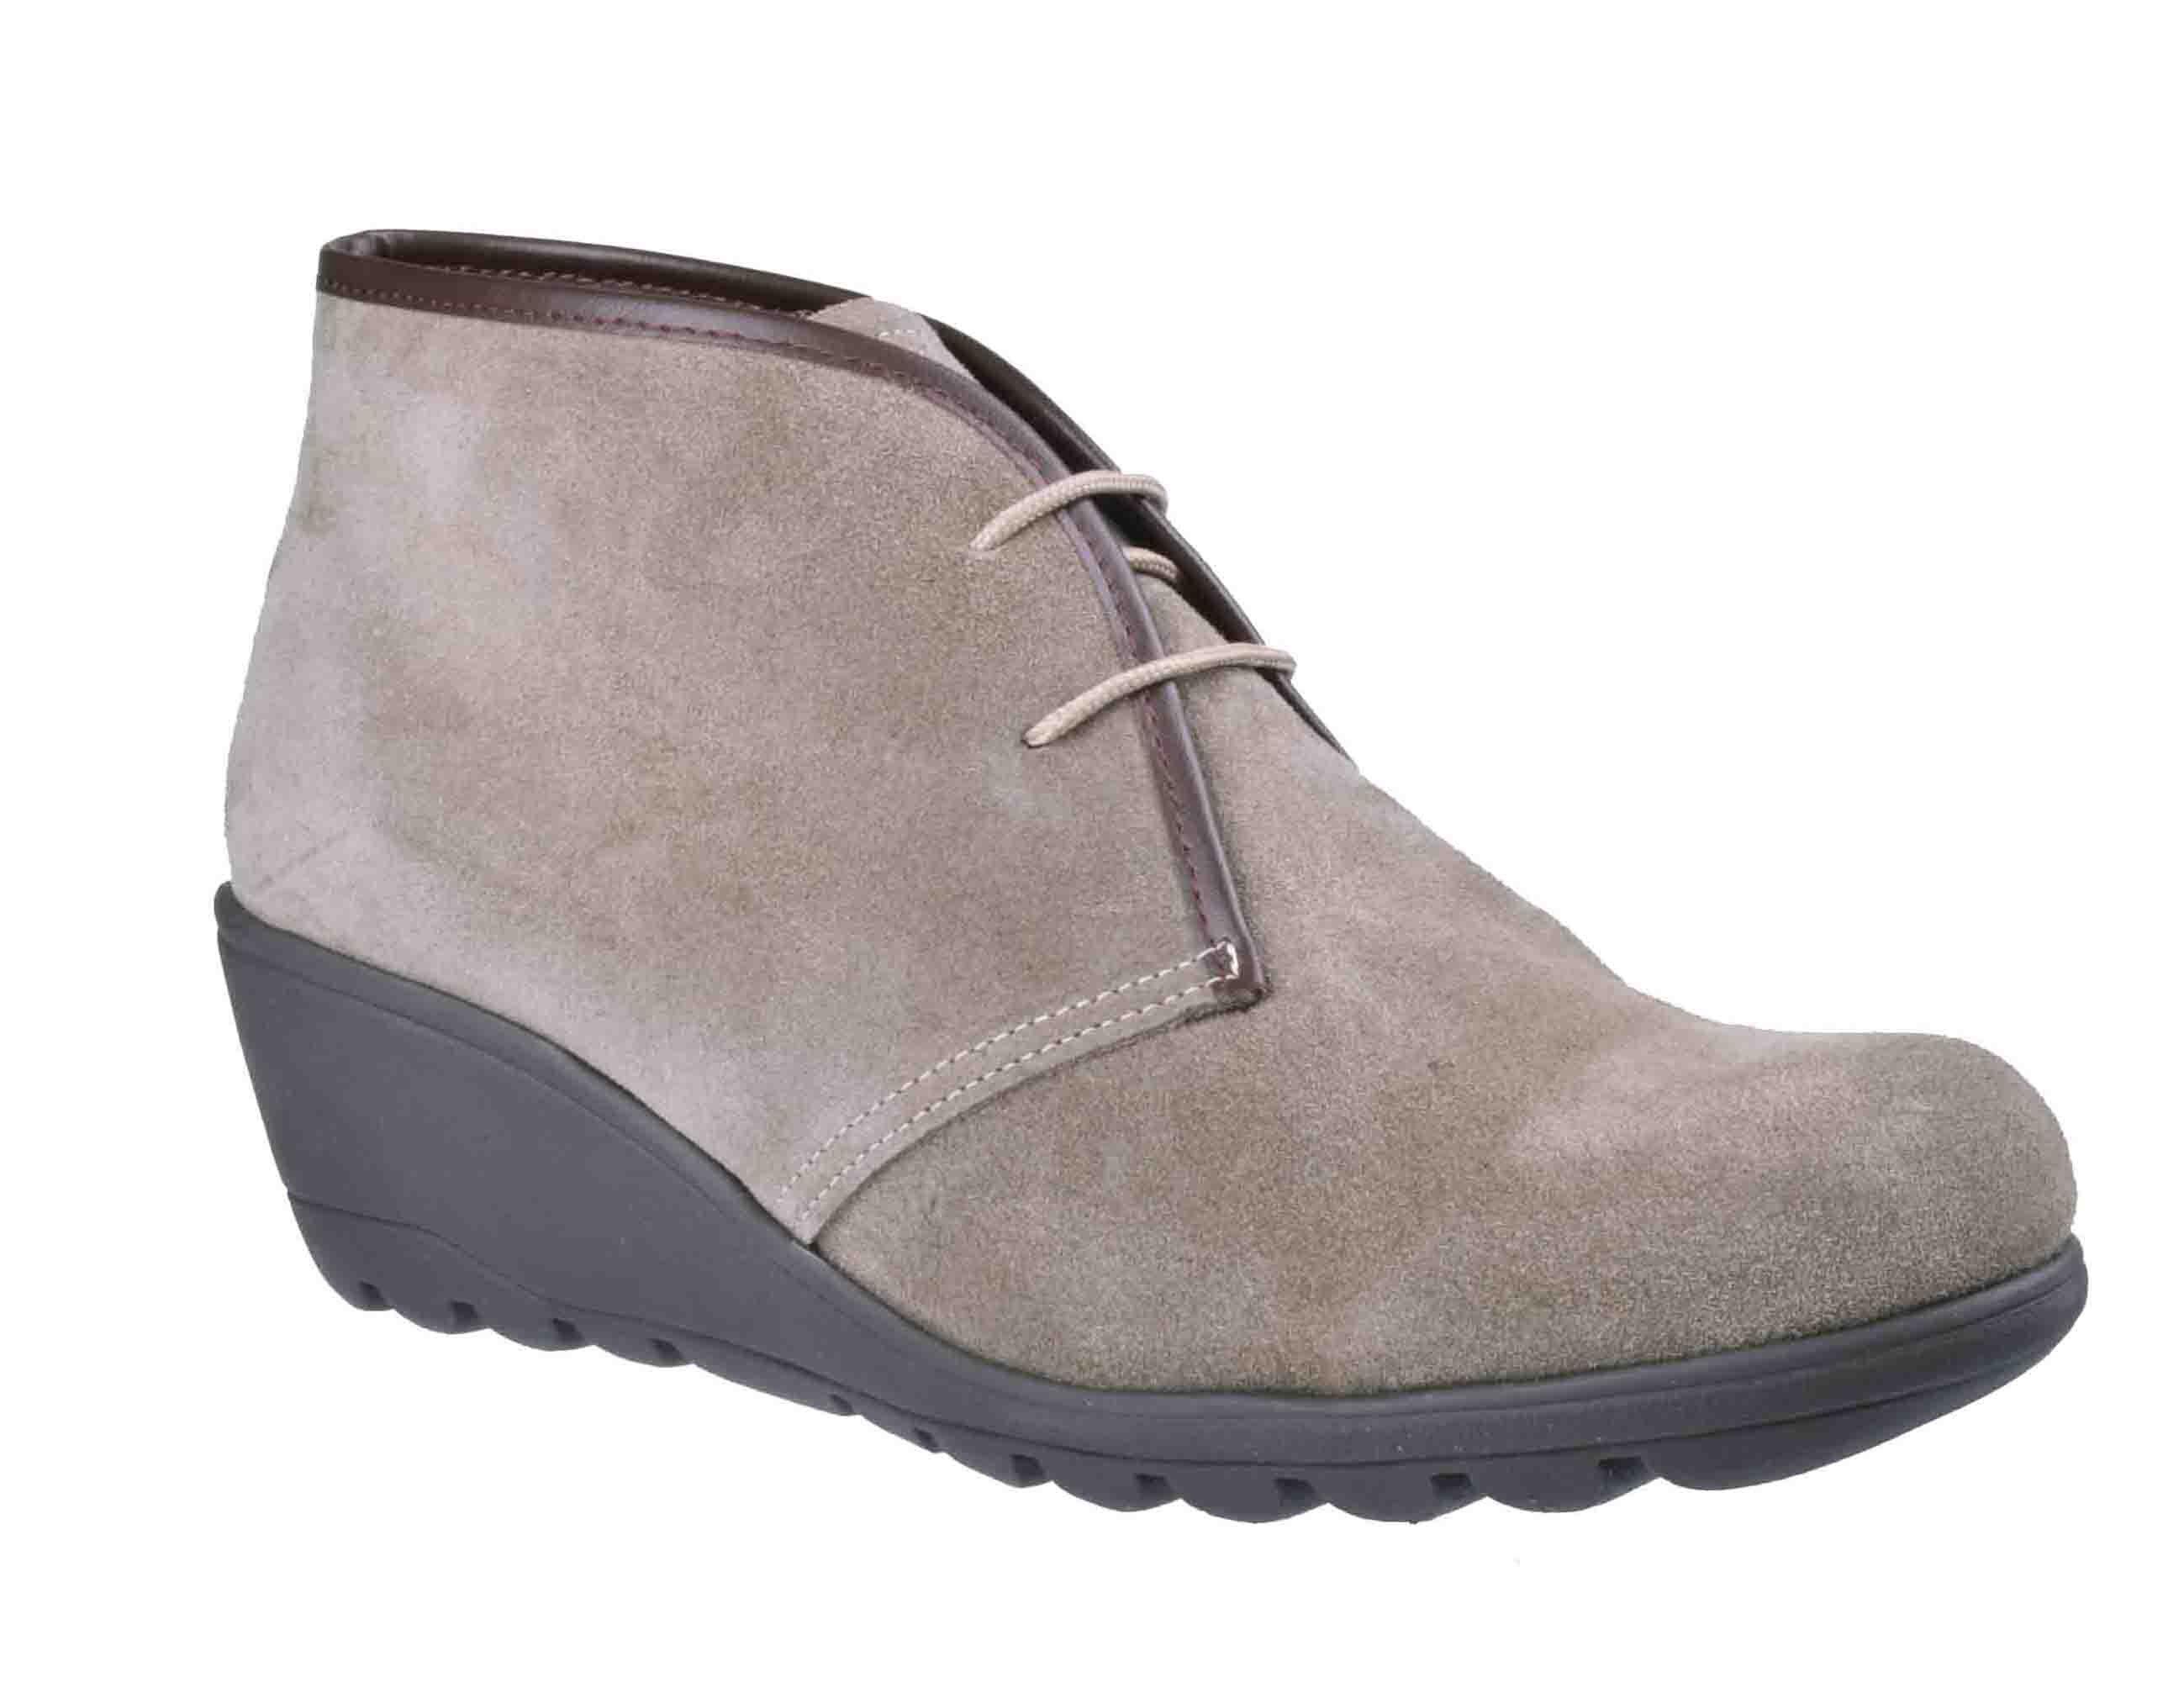 0ef7b62fd1e Γυναικεια Δερματινα Μποτακια Apostolidis Shoes City Πουρο ...